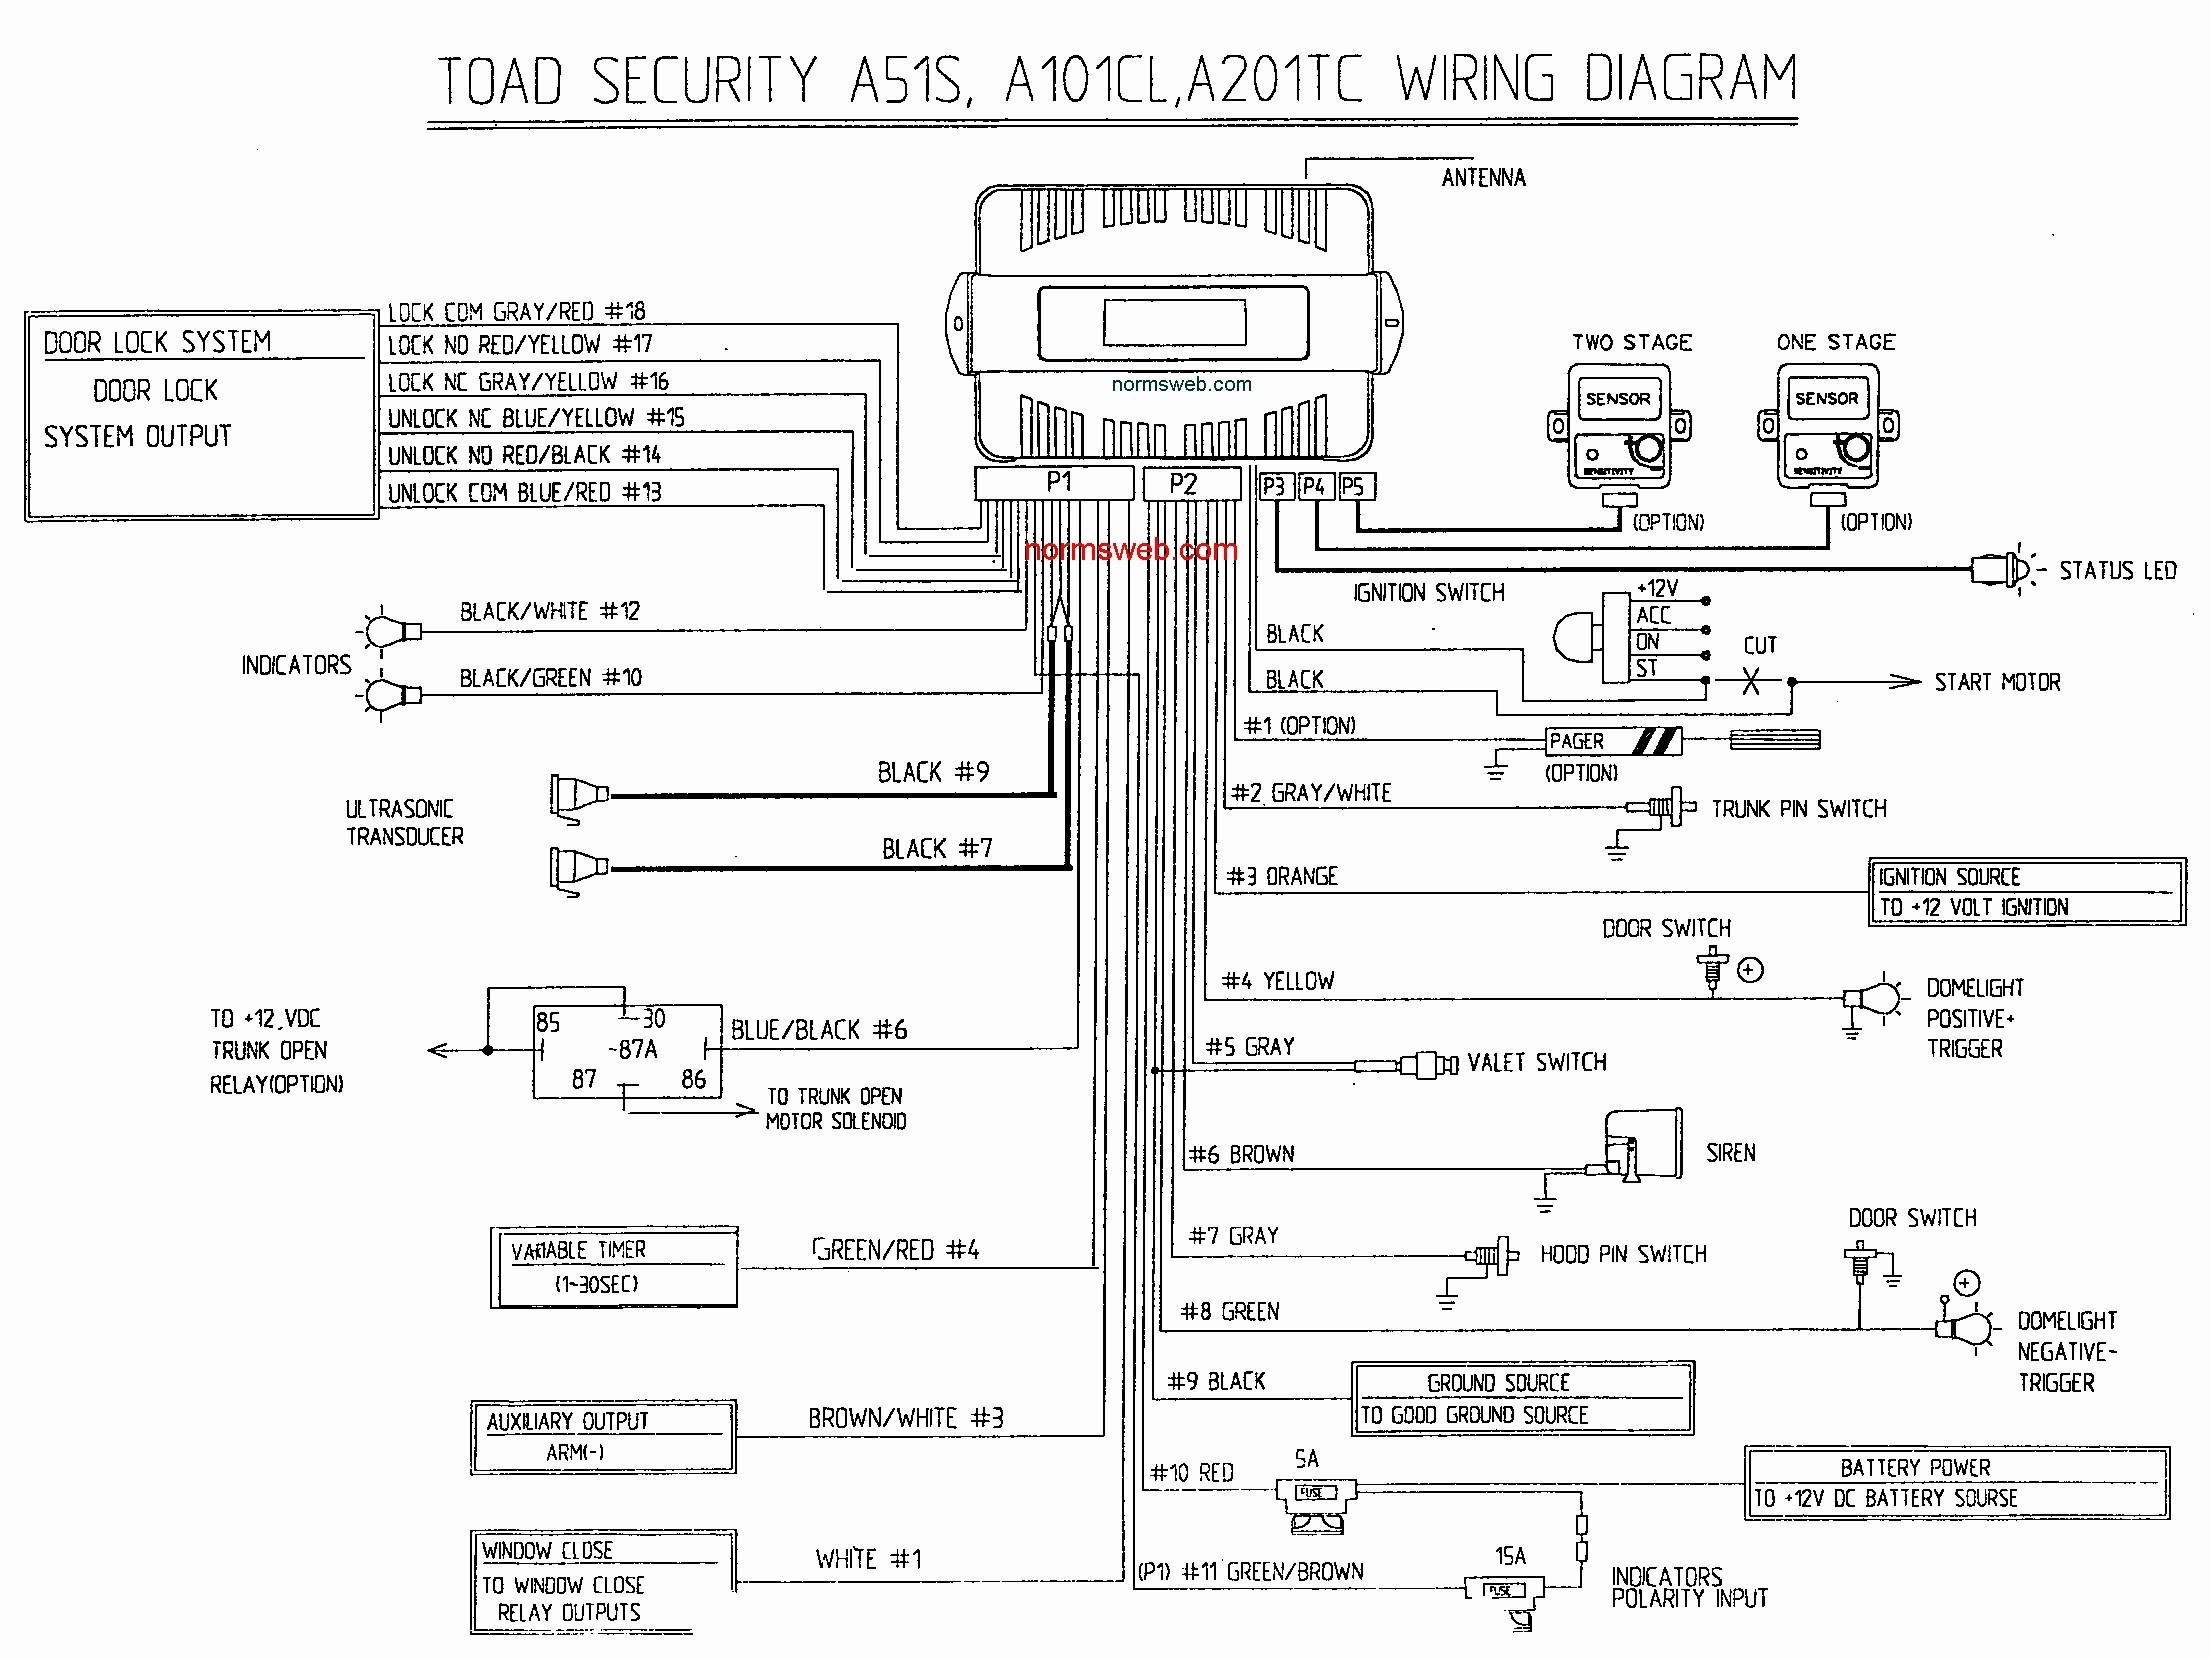 bulldog security wiring diagram 4 wire trailer lights keyles entry system remote starter avital 4103 2004 f250 start diagrams car alarm